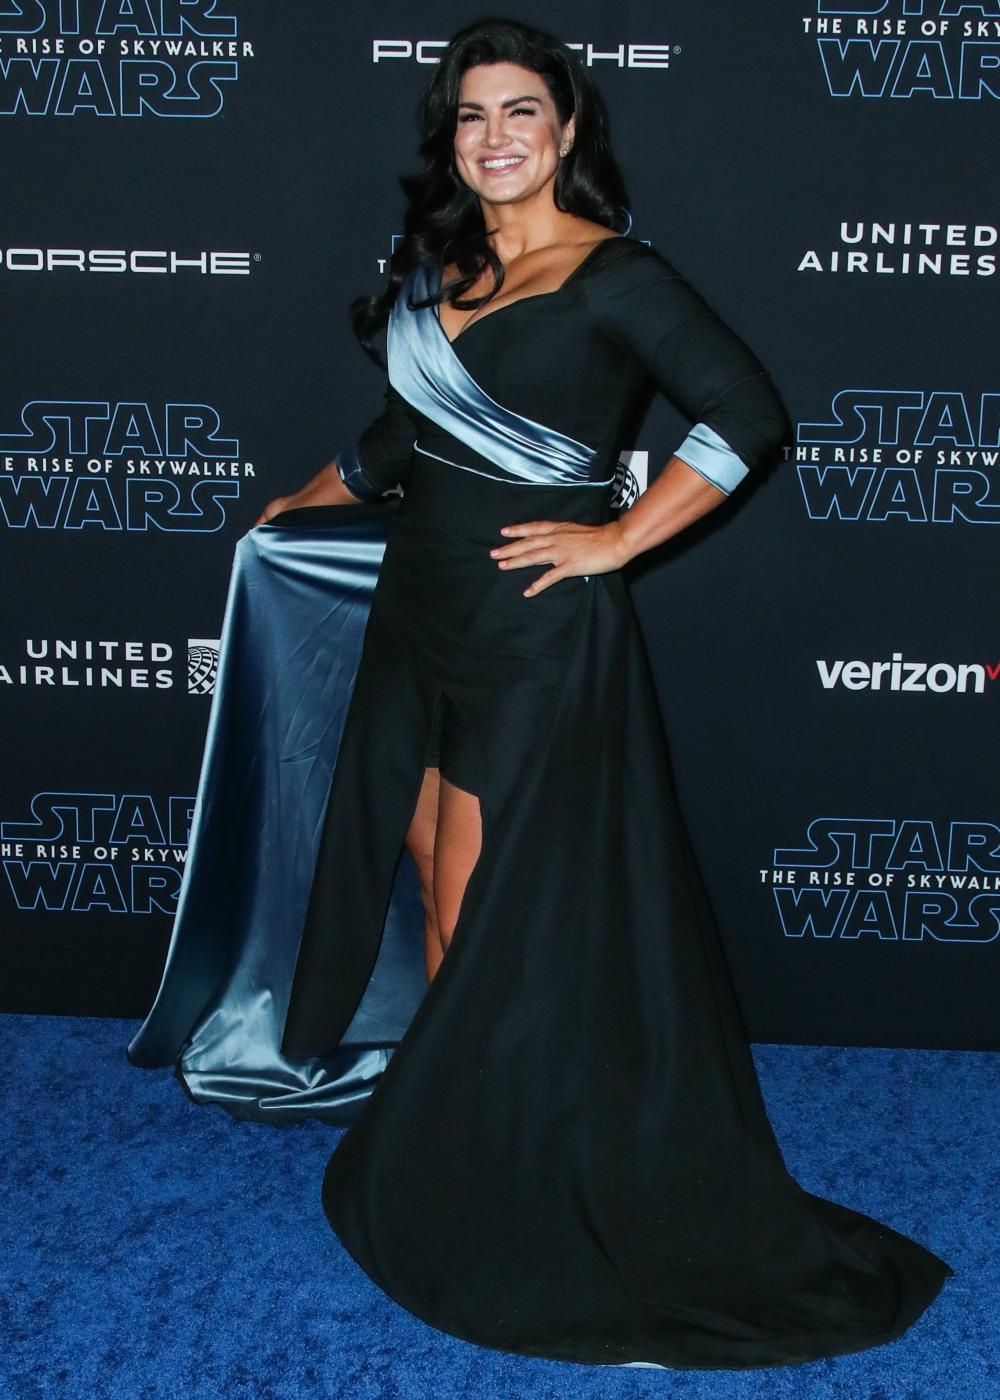 World Premiere Of Disney's 'Star Wars: The Rise Of Skywalker'